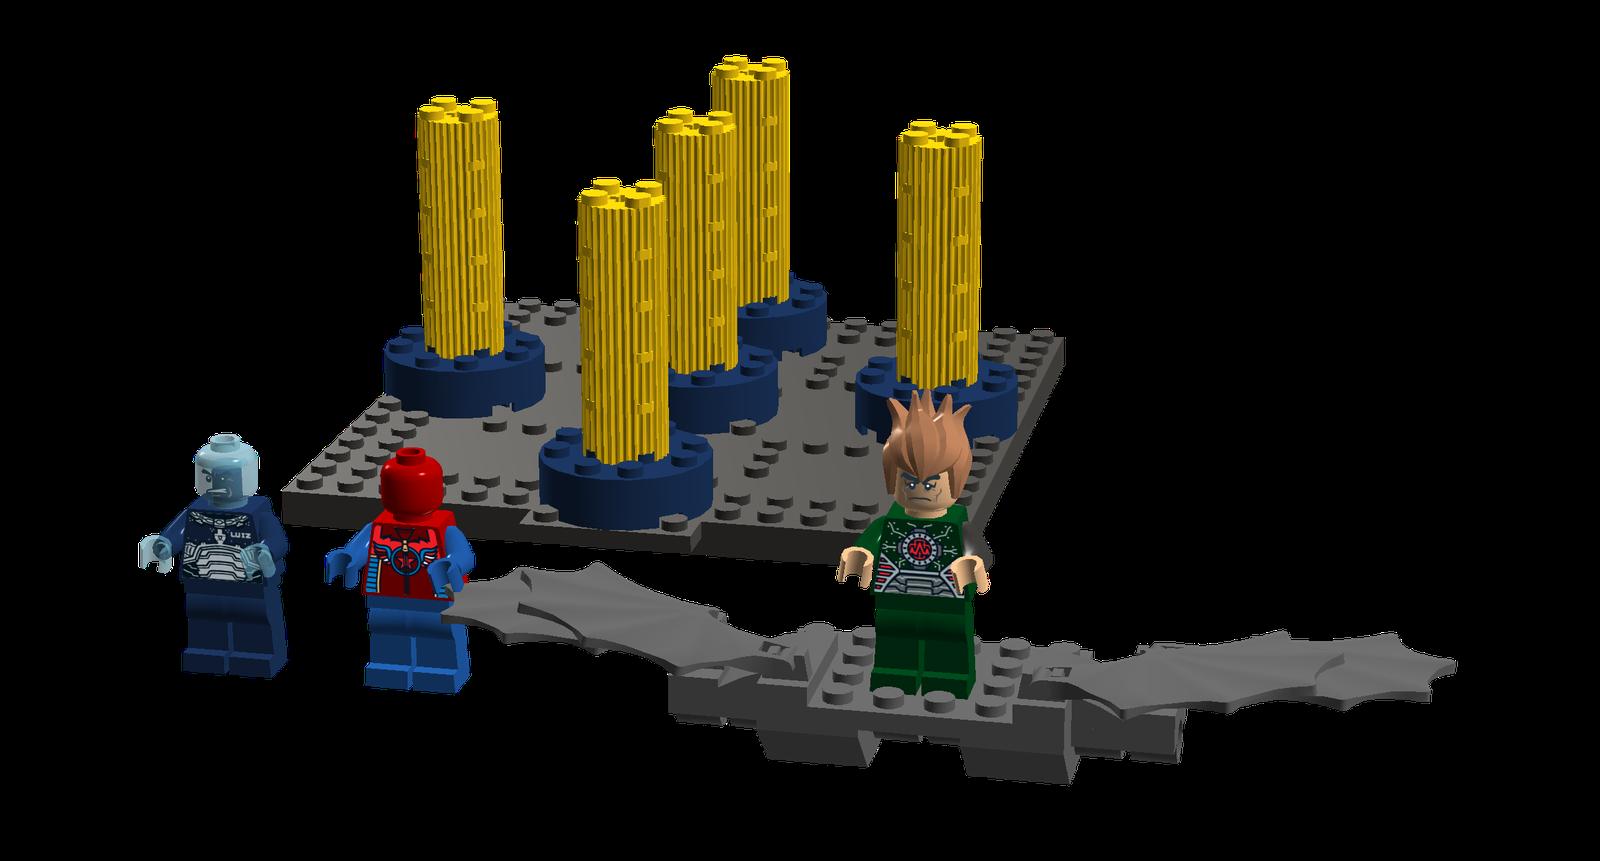 Lego ideas product ideas amazing spider man 2 electro outlet - Lego the amazing spider man 3 ...